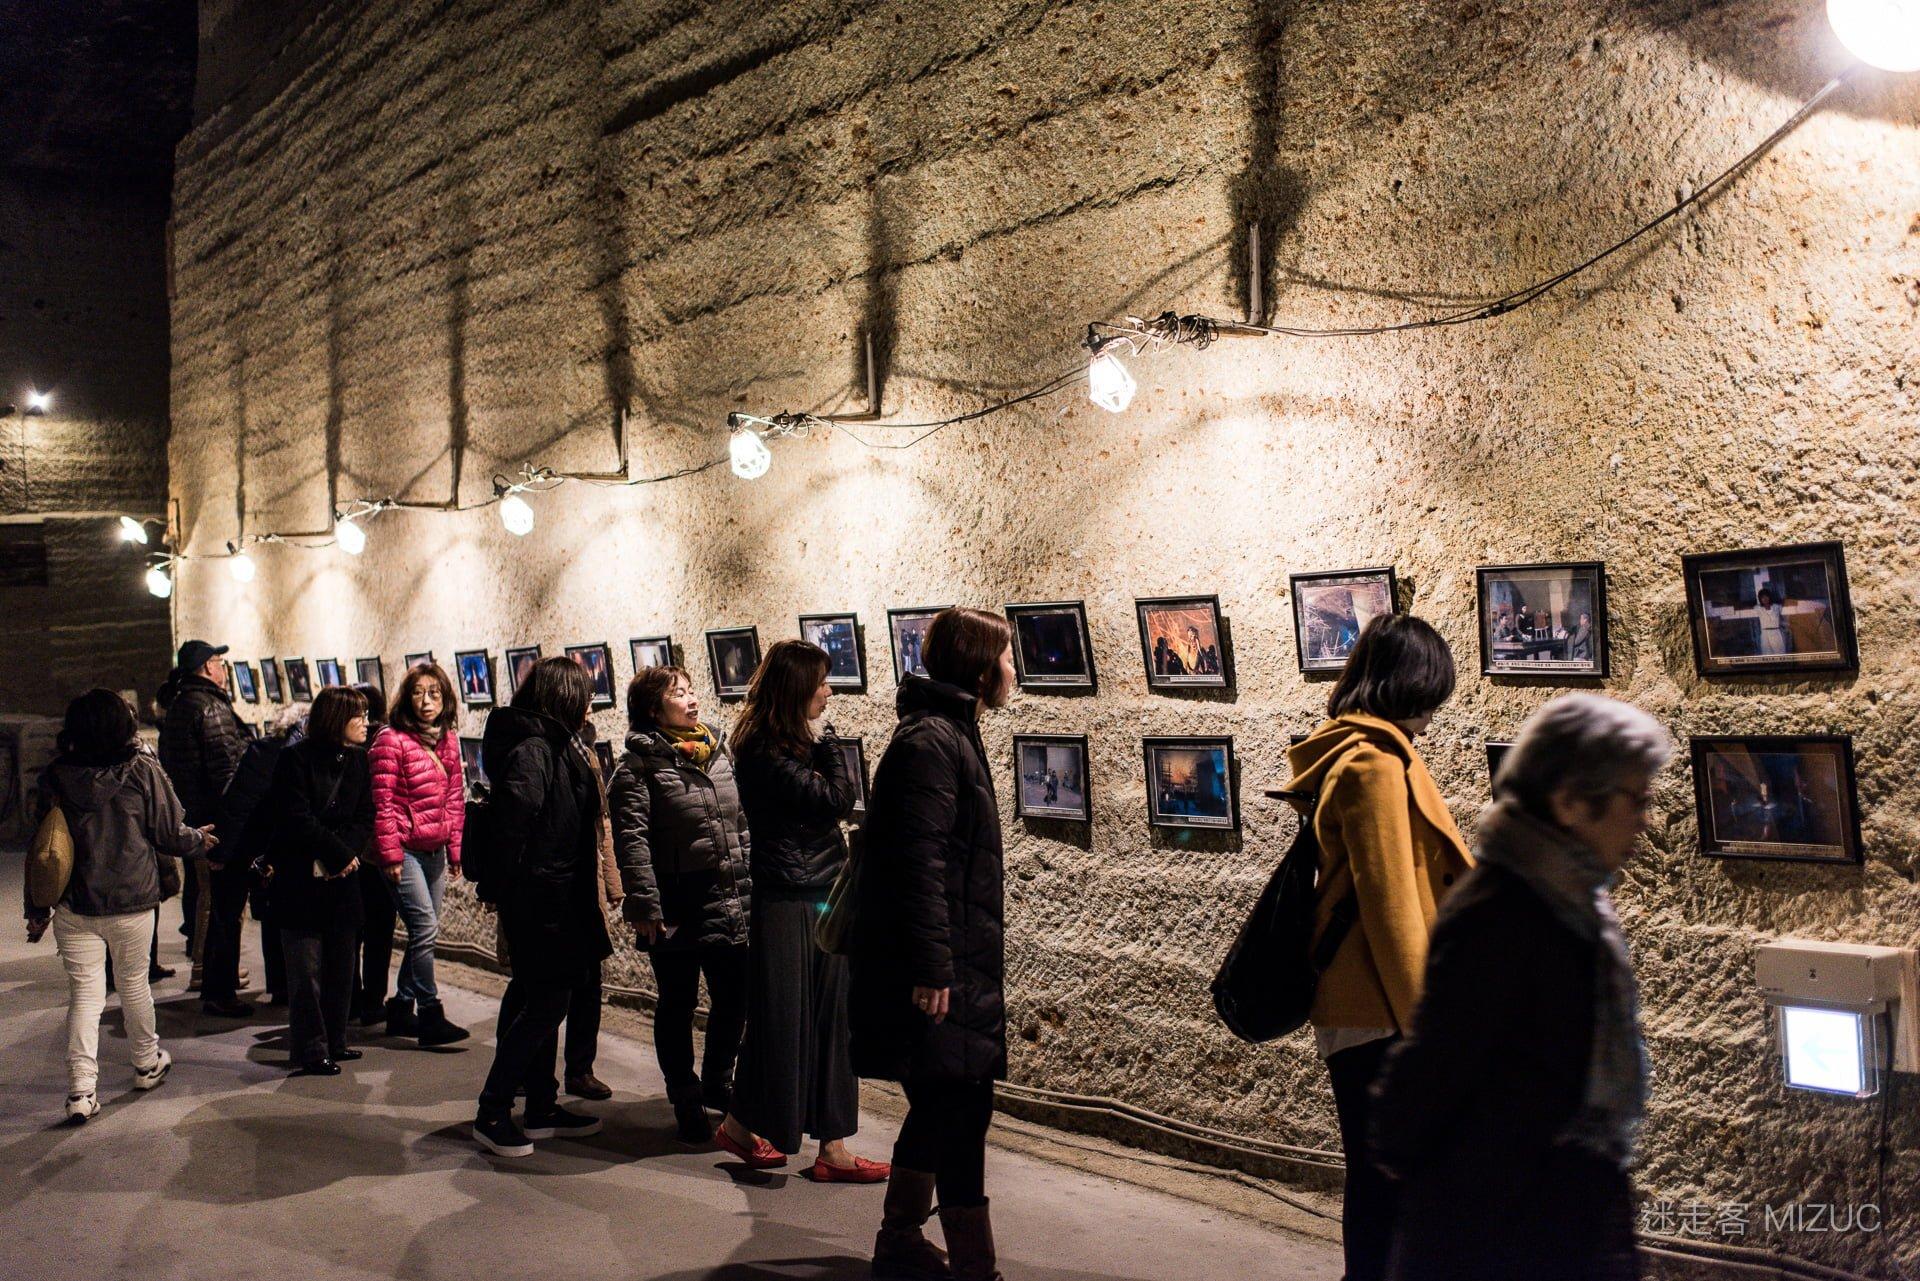 201711 Ibaraki Tochigi Gunma Japan Travel By RentalCar 55 日本自駕旅遊/北關東三縣「茨城、櫪木、群馬」秋天美食、溫泉與瀑布秘境百景(精選照片分享)